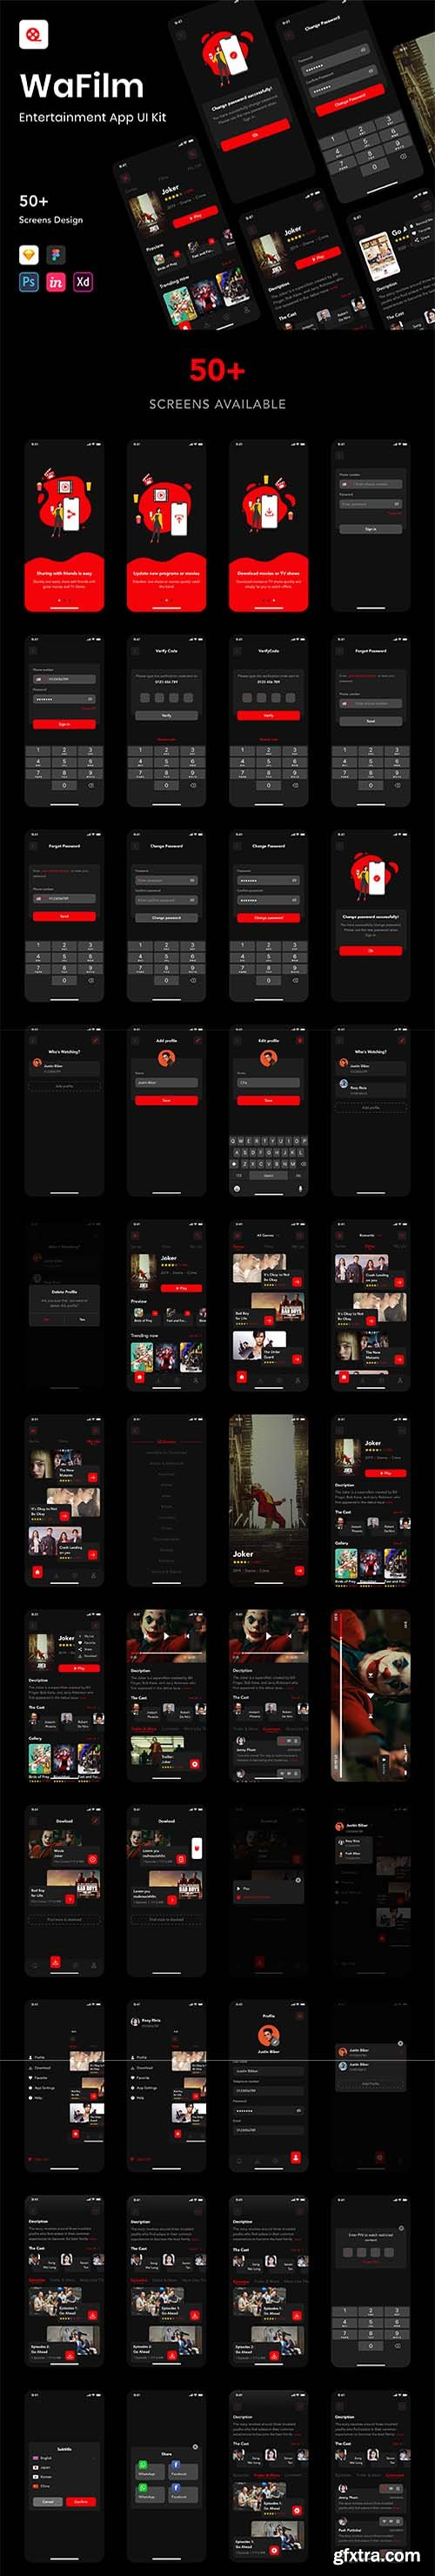 WaFilm - Entertainment App UI Kit